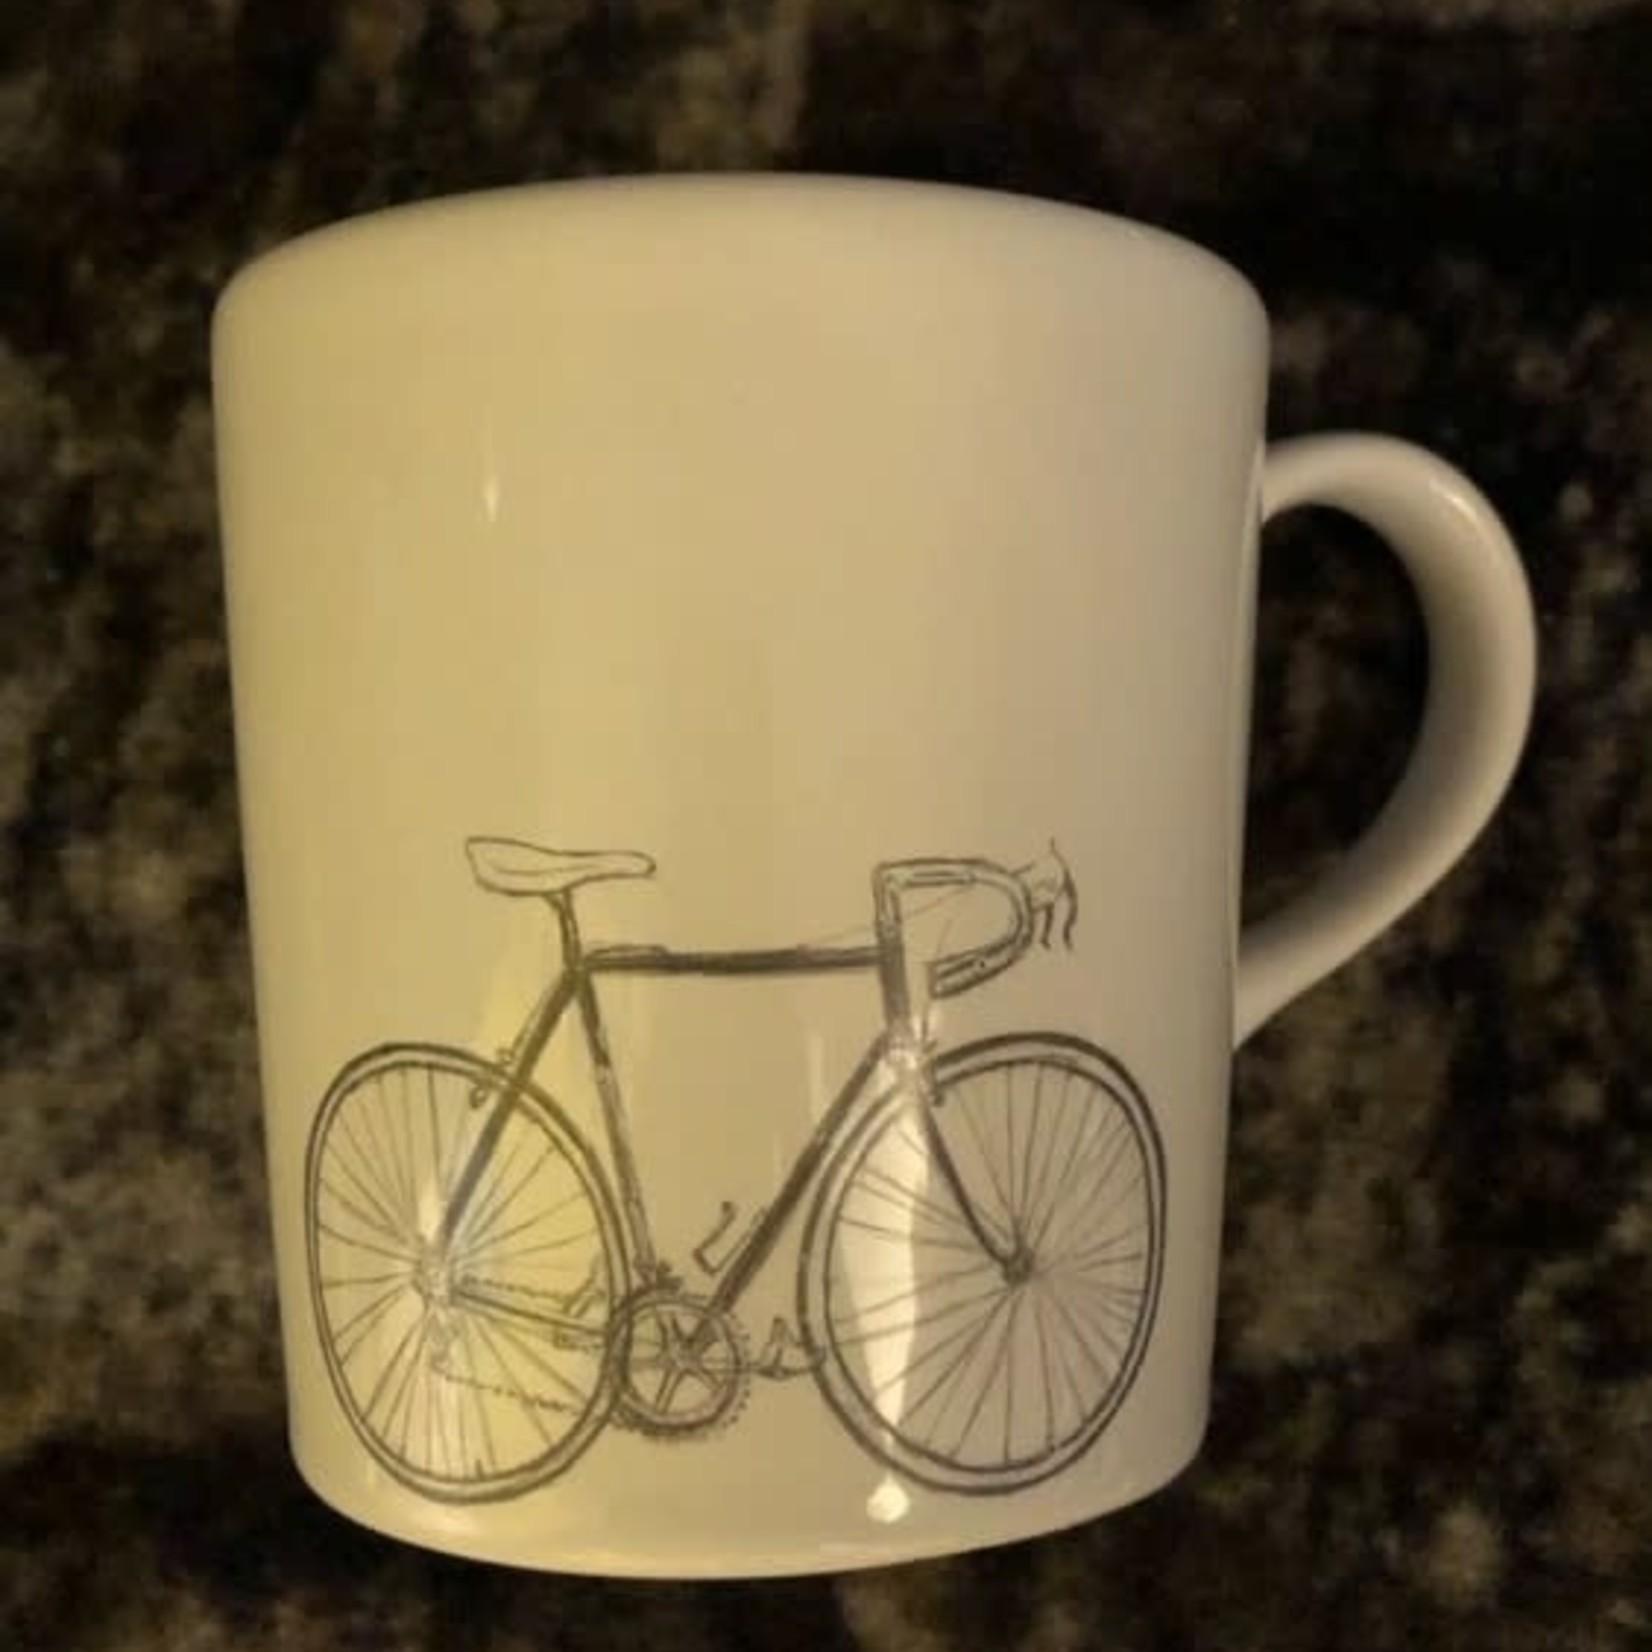 Coffee mug 'bike'  Eddy Merckx ceramics